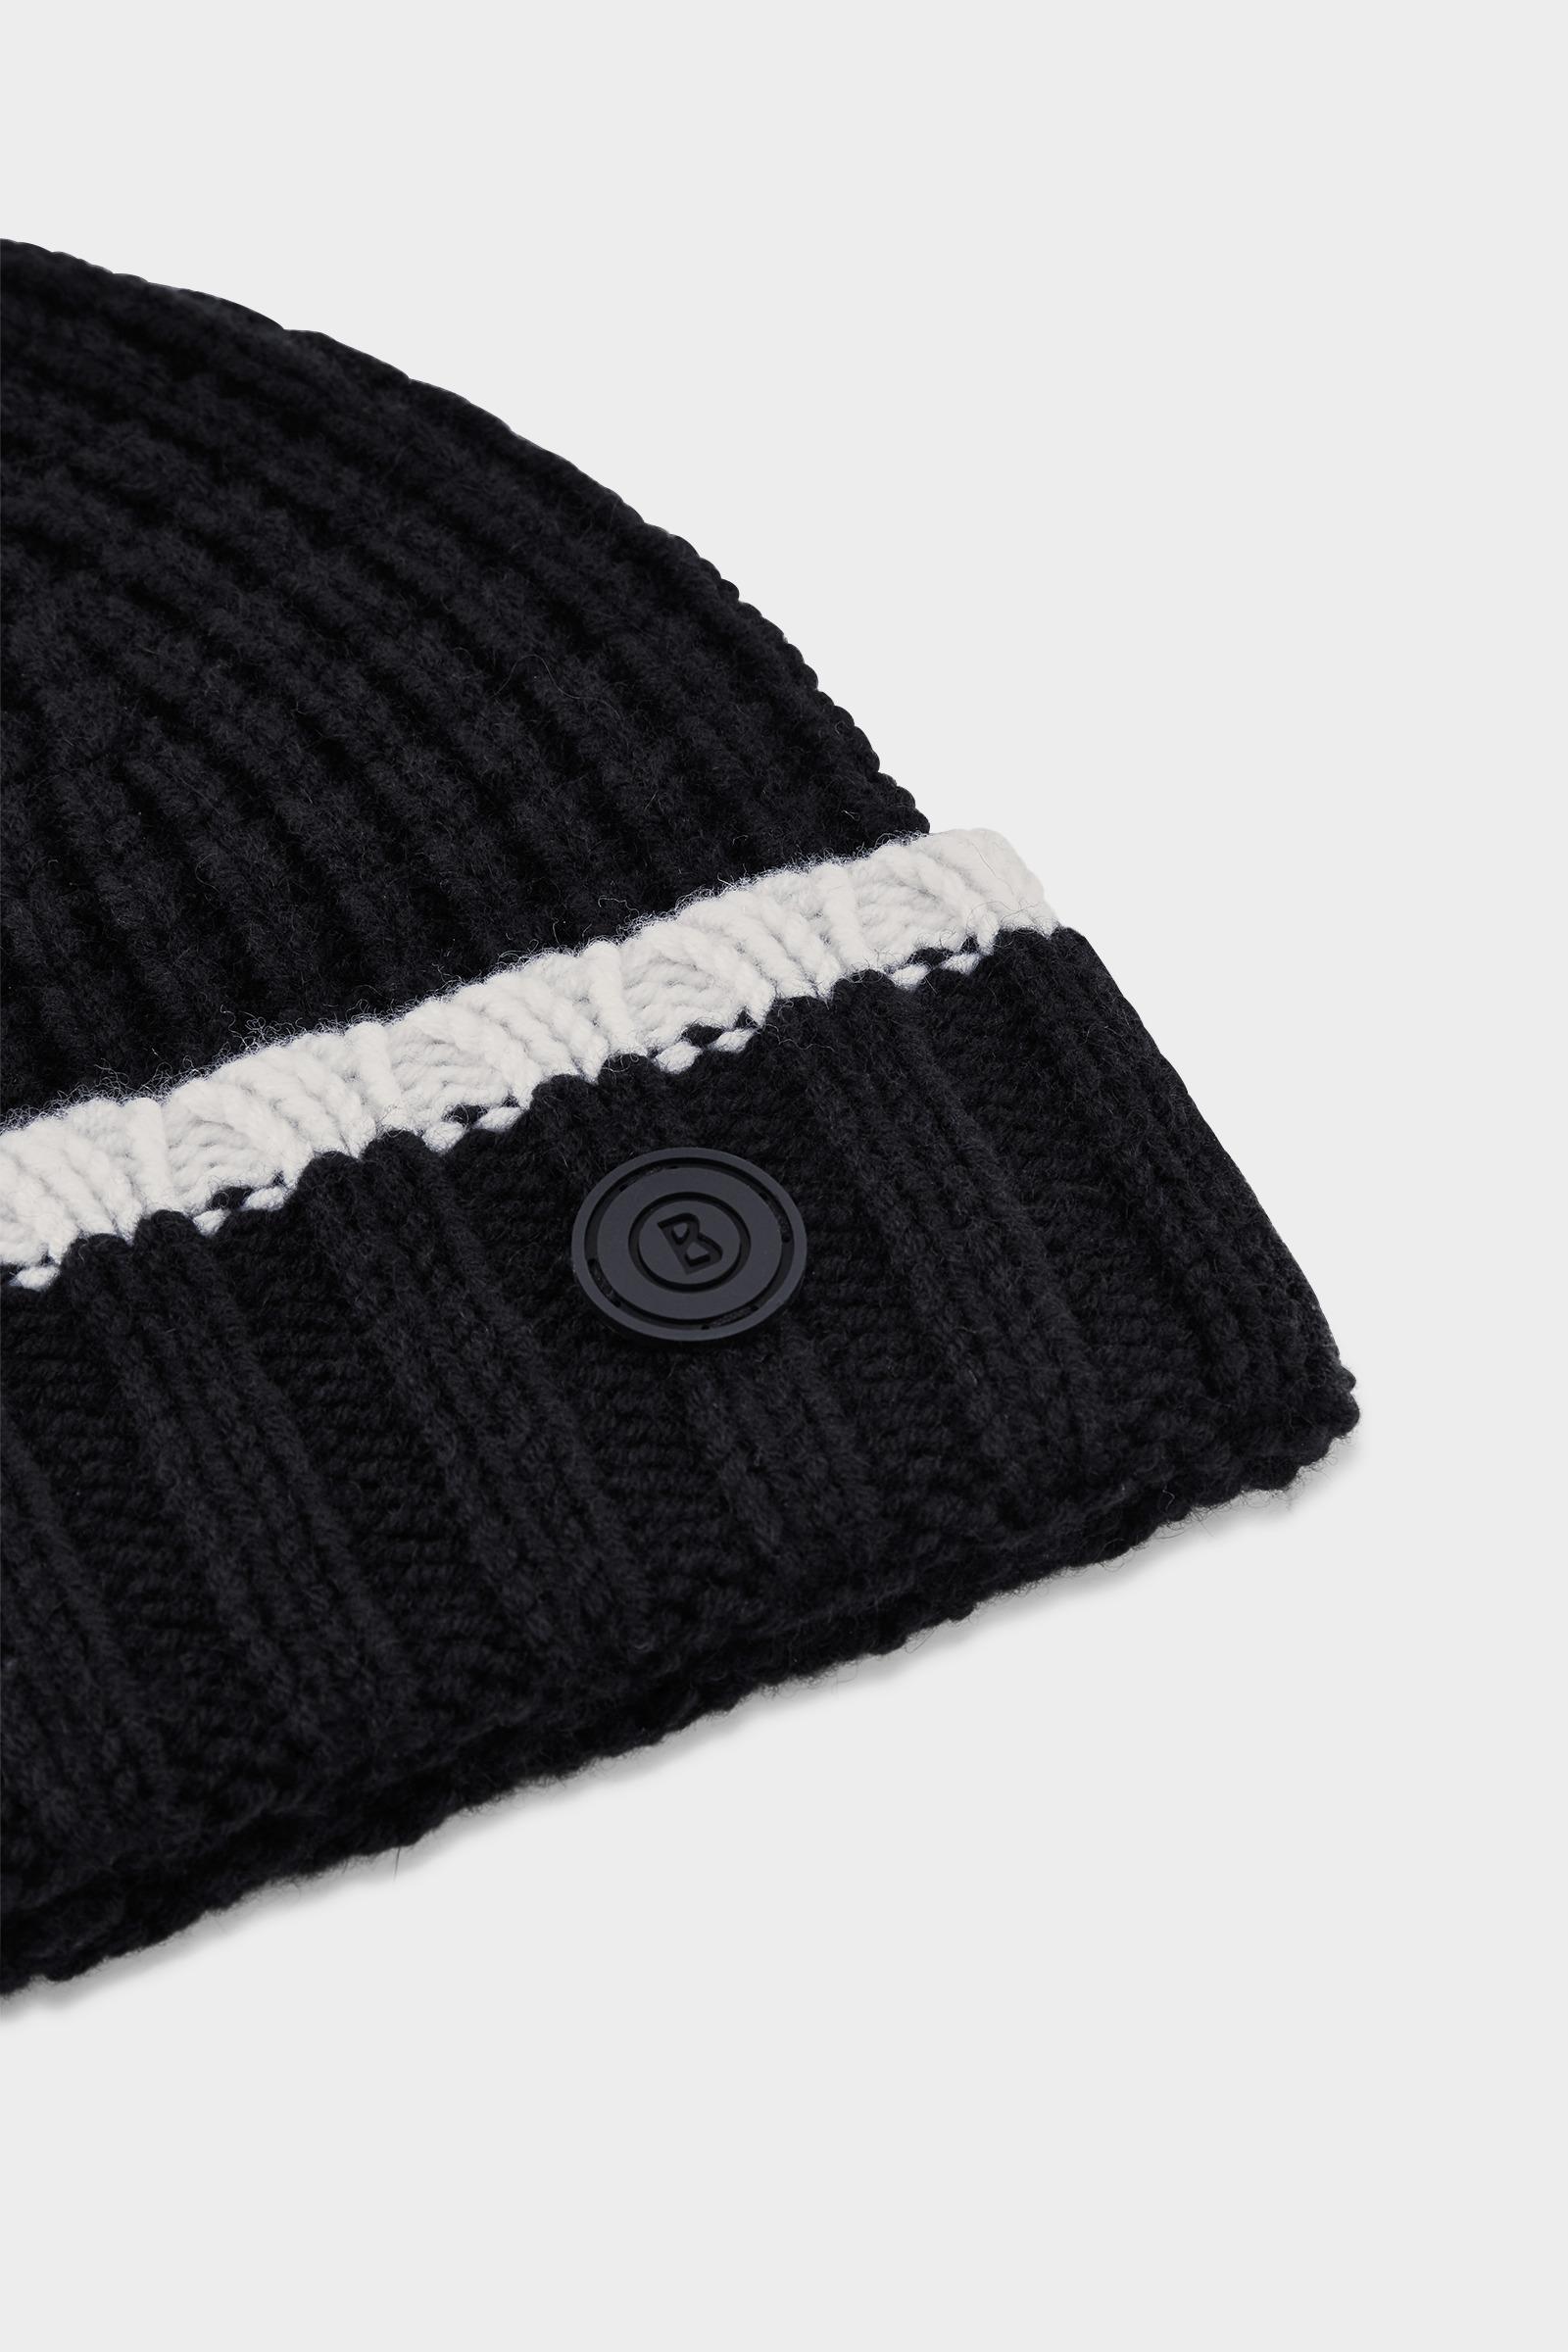 ffac58d7f57 Bogner Albi Knitted Hat In Black in Black for Men - Lyst